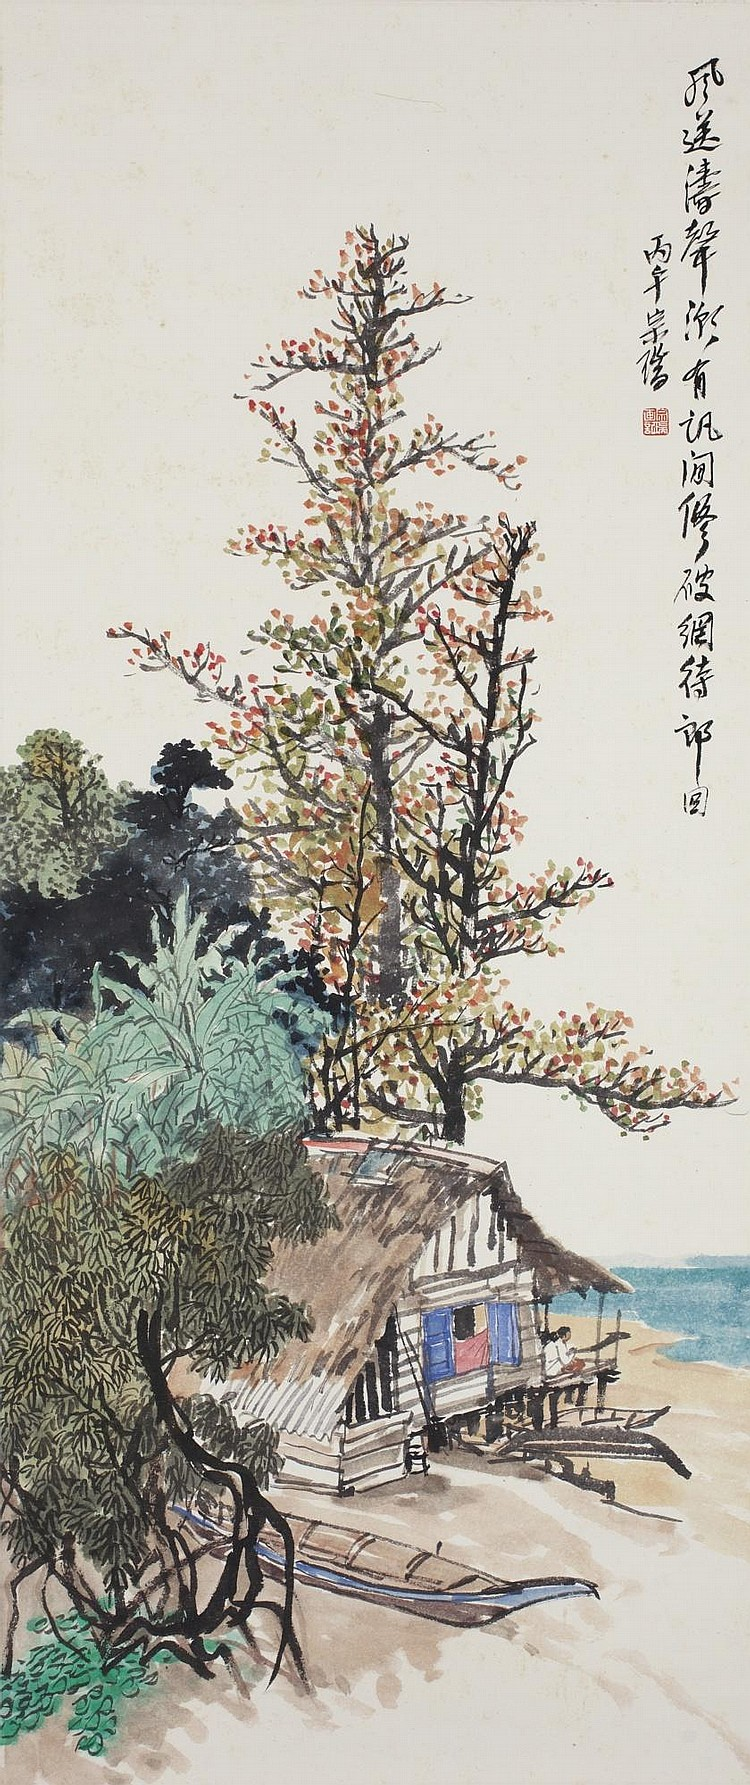 CHEN CHONG SWEE